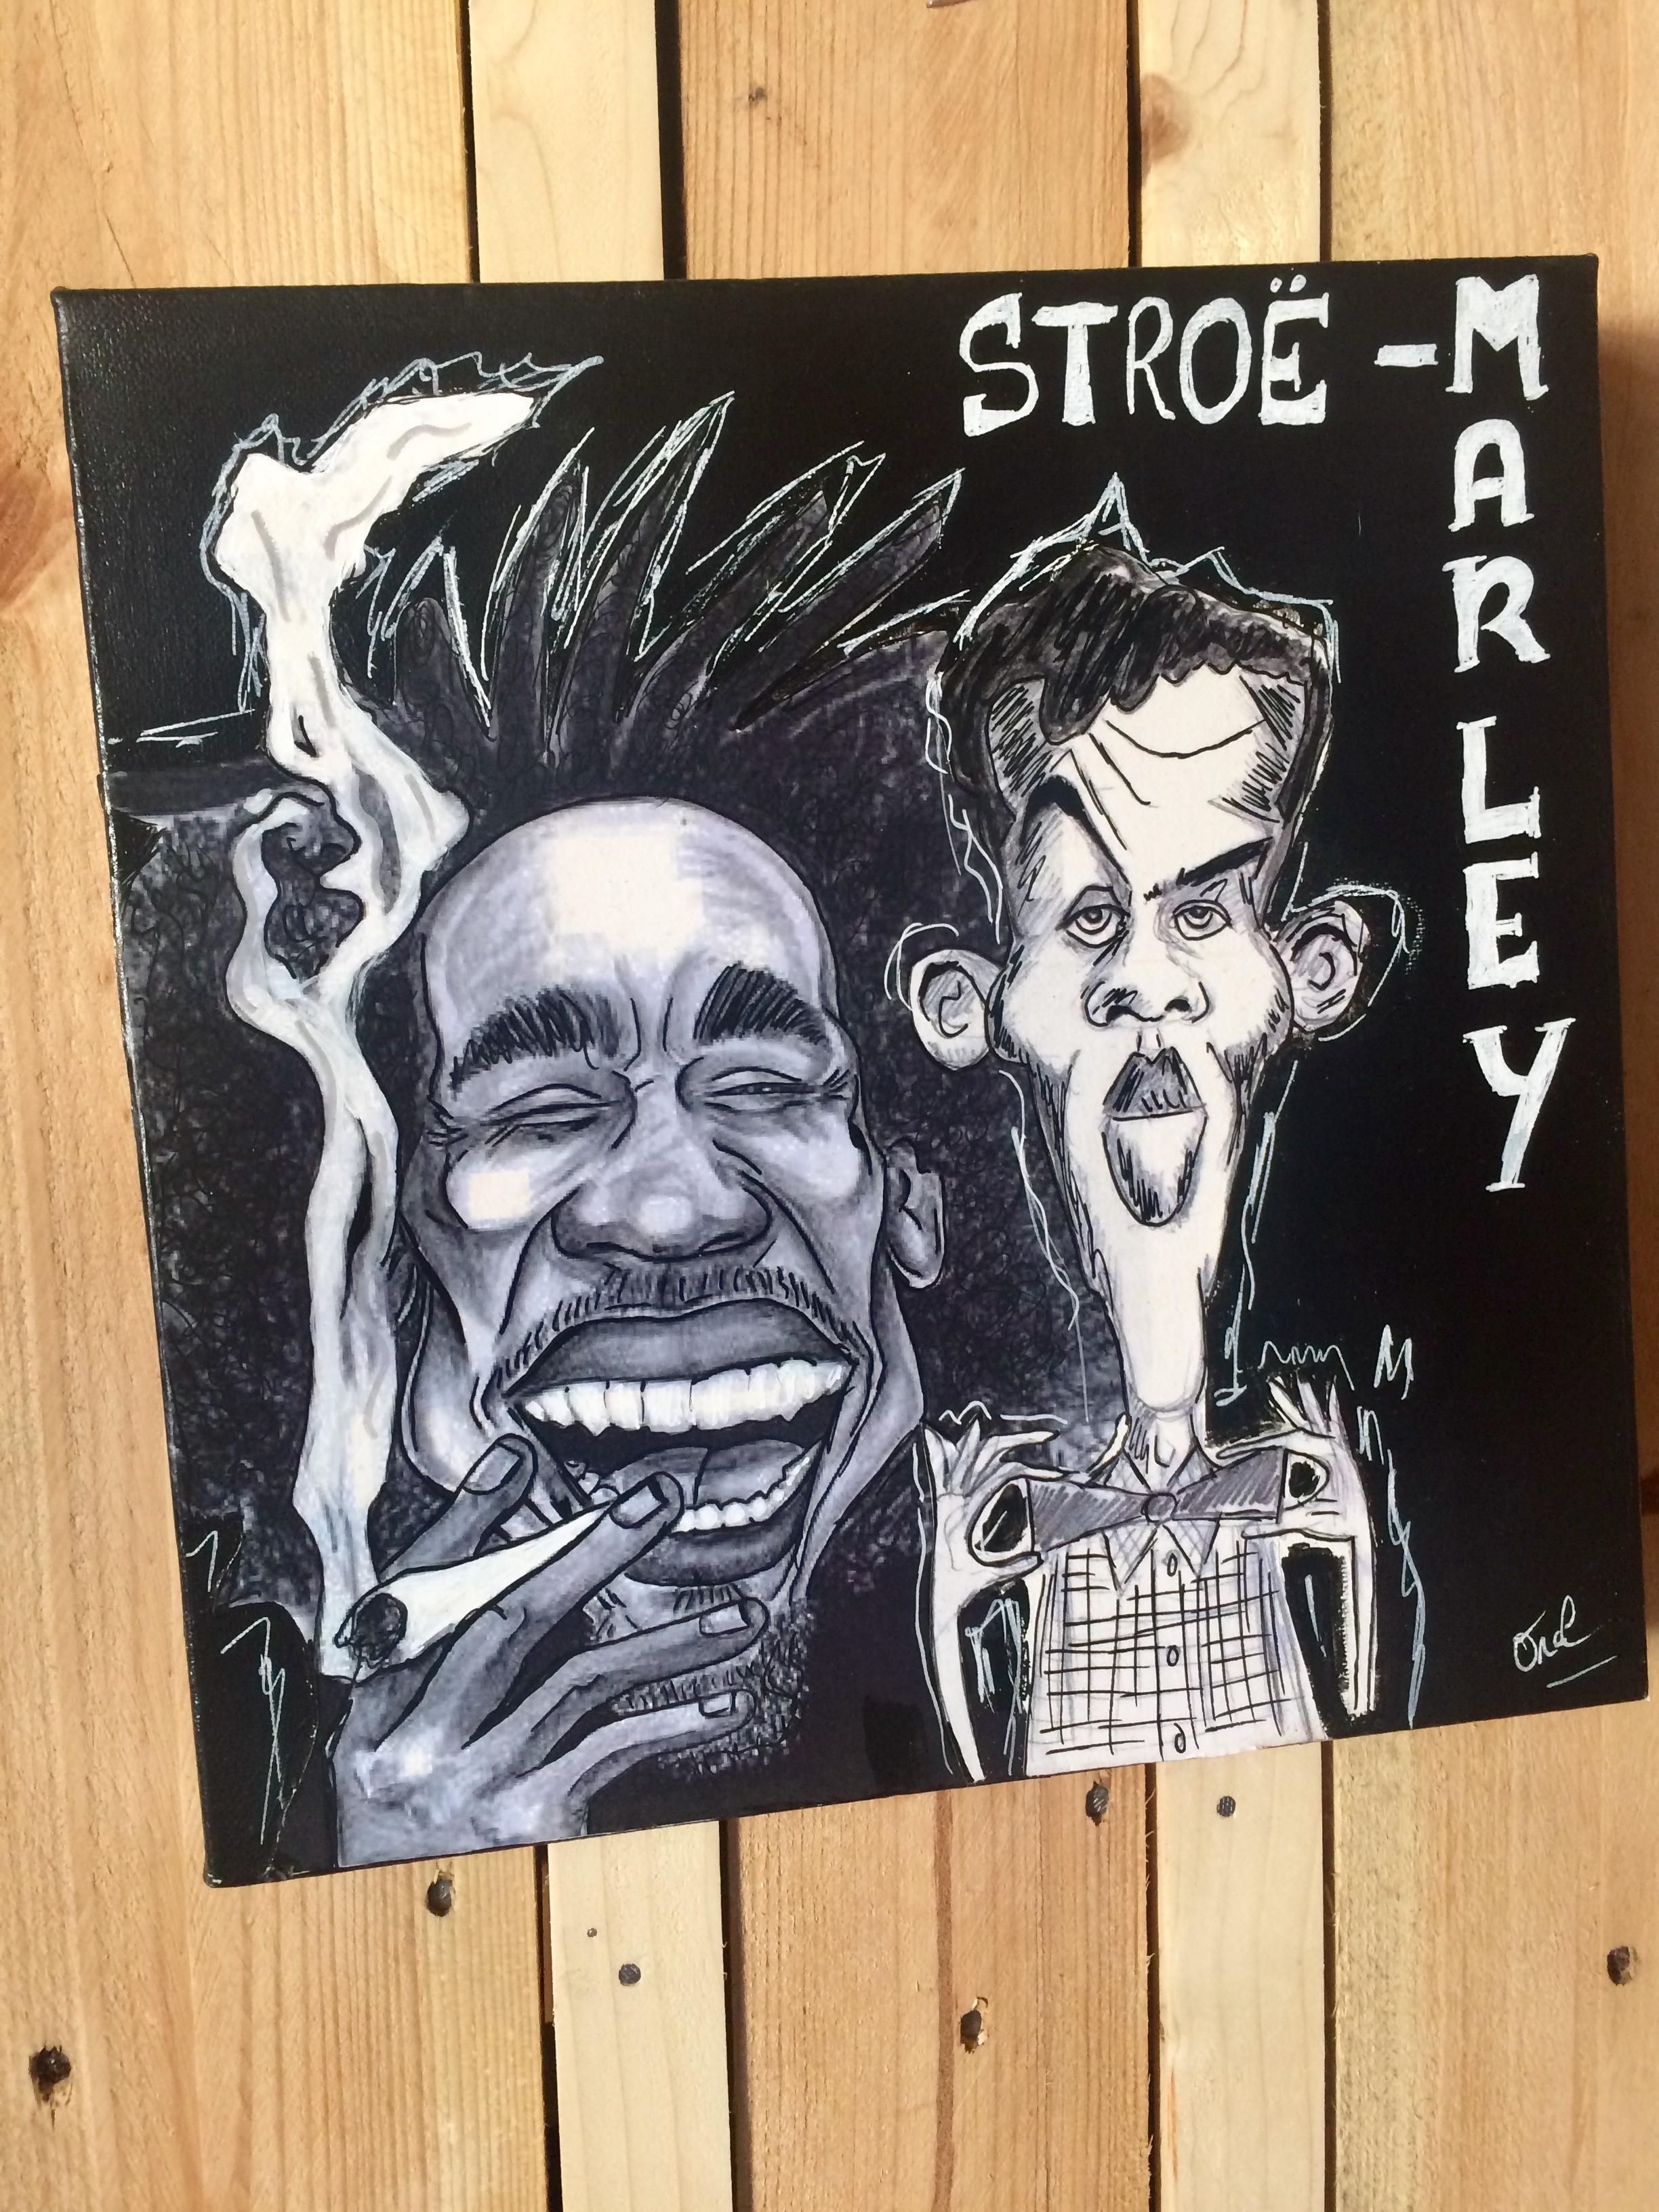 Ströe-Marley